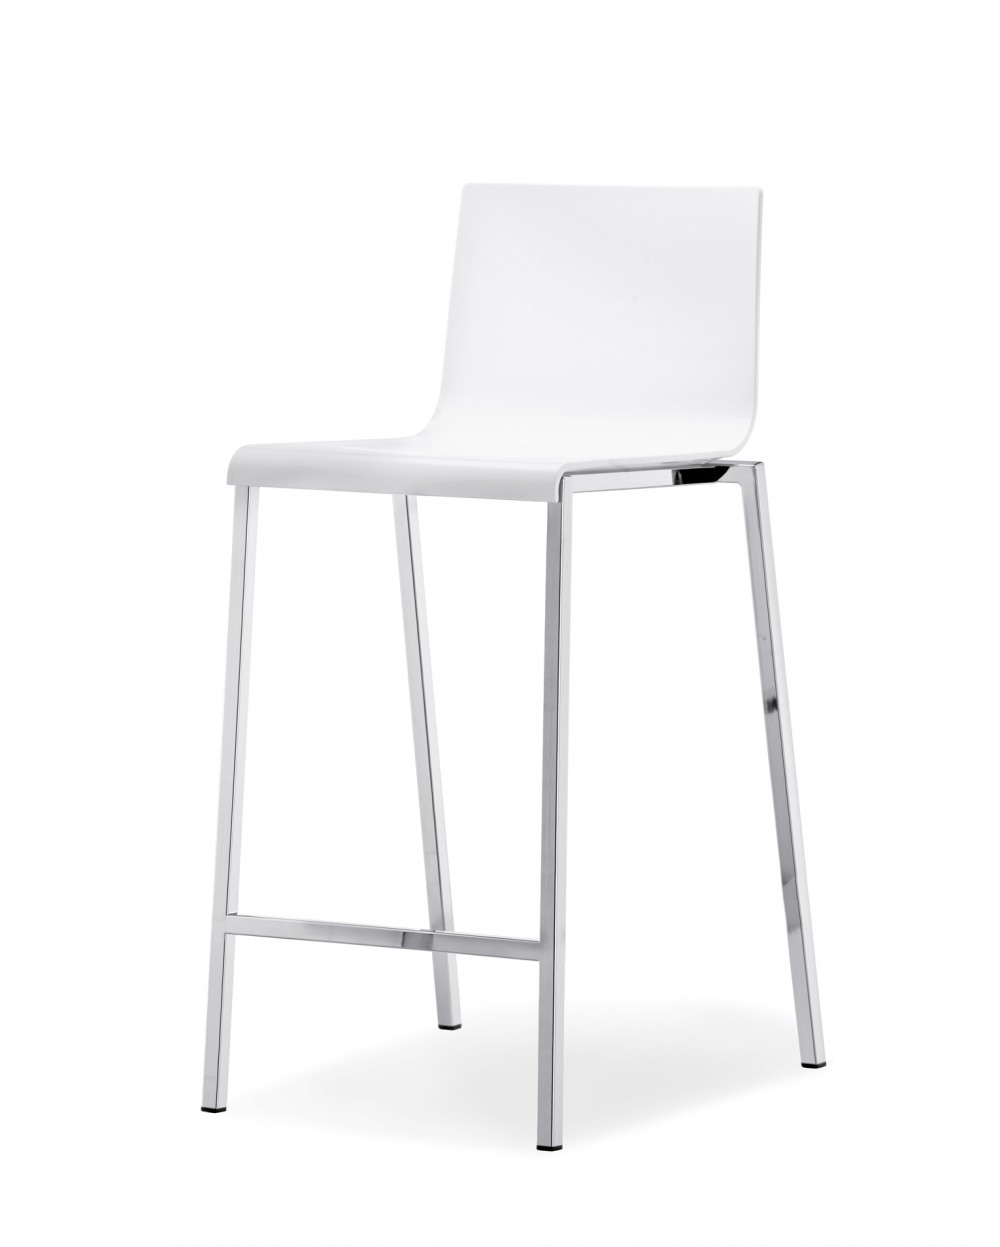 design barstuhl wei barhocker wei chrome sitzh he 65 cm. Black Bedroom Furniture Sets. Home Design Ideas